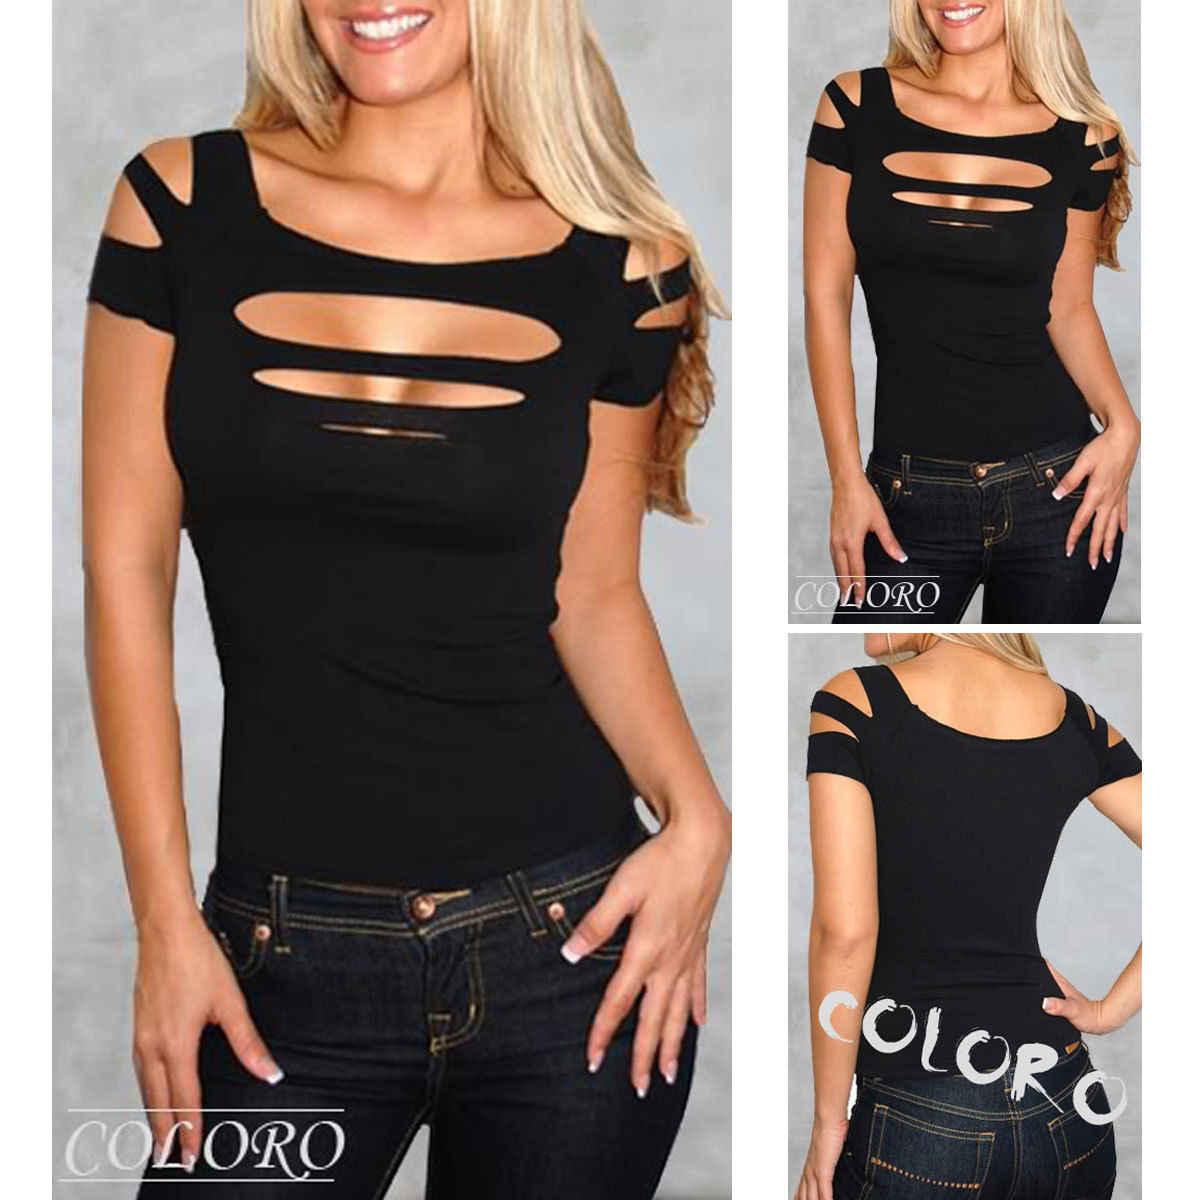 Gogoboi High Quality Fashion Ladies Womans Sexy Ripped Slashed Black Tight  T Shirt Top Clubwear Cut 58a7dac67